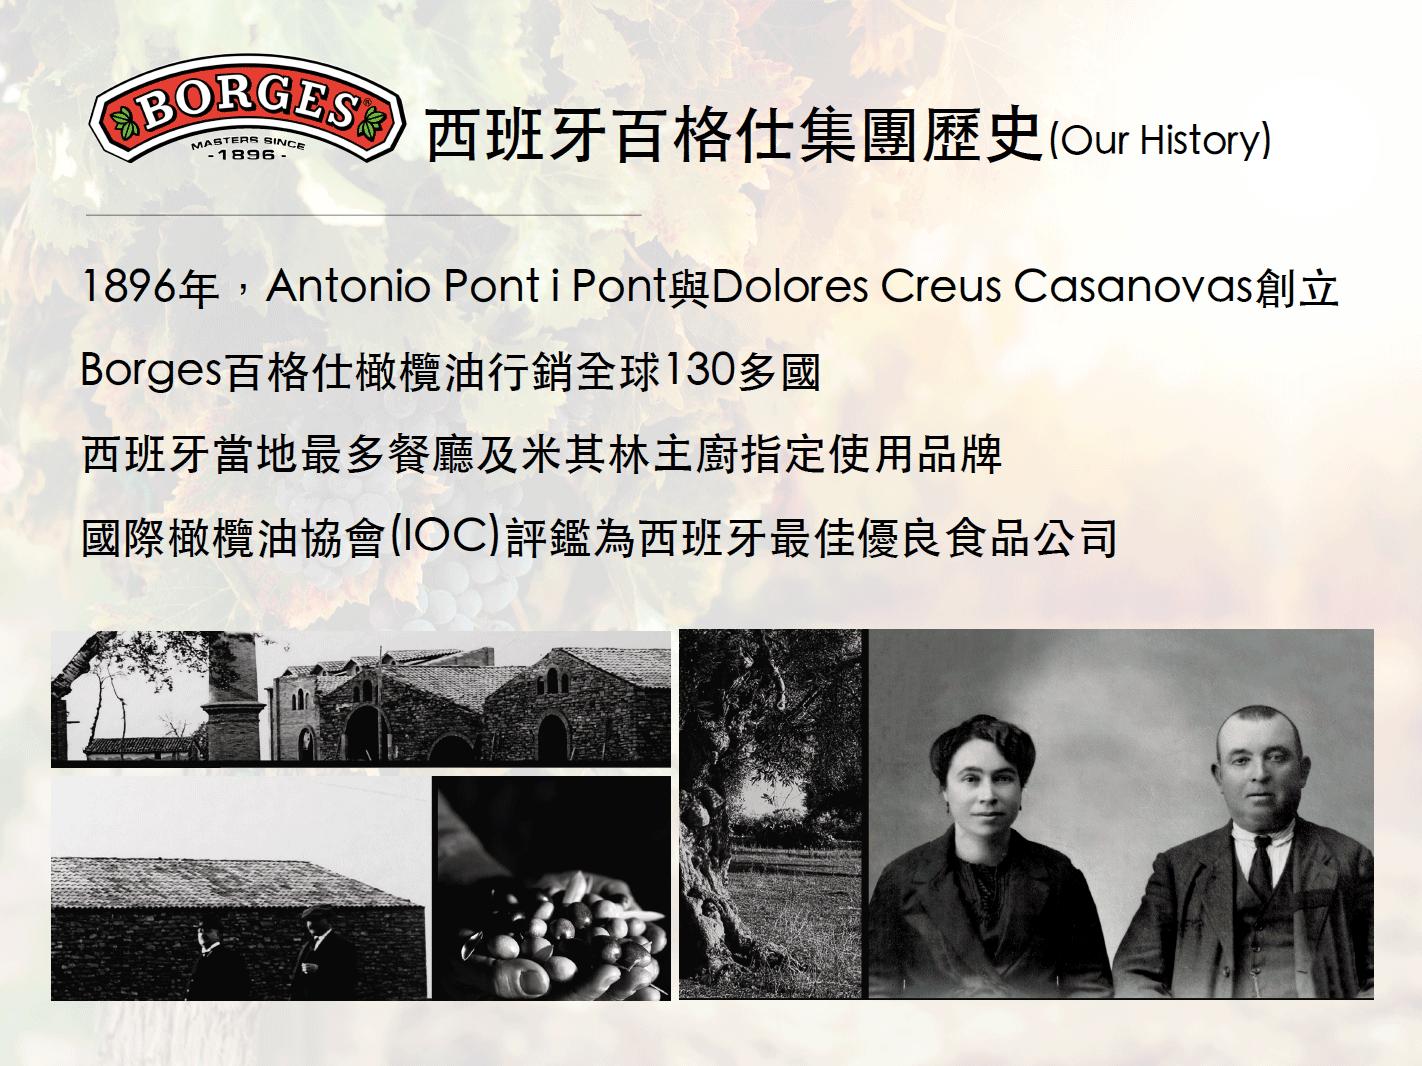 西班牙百格仕集團歷史(Our History)